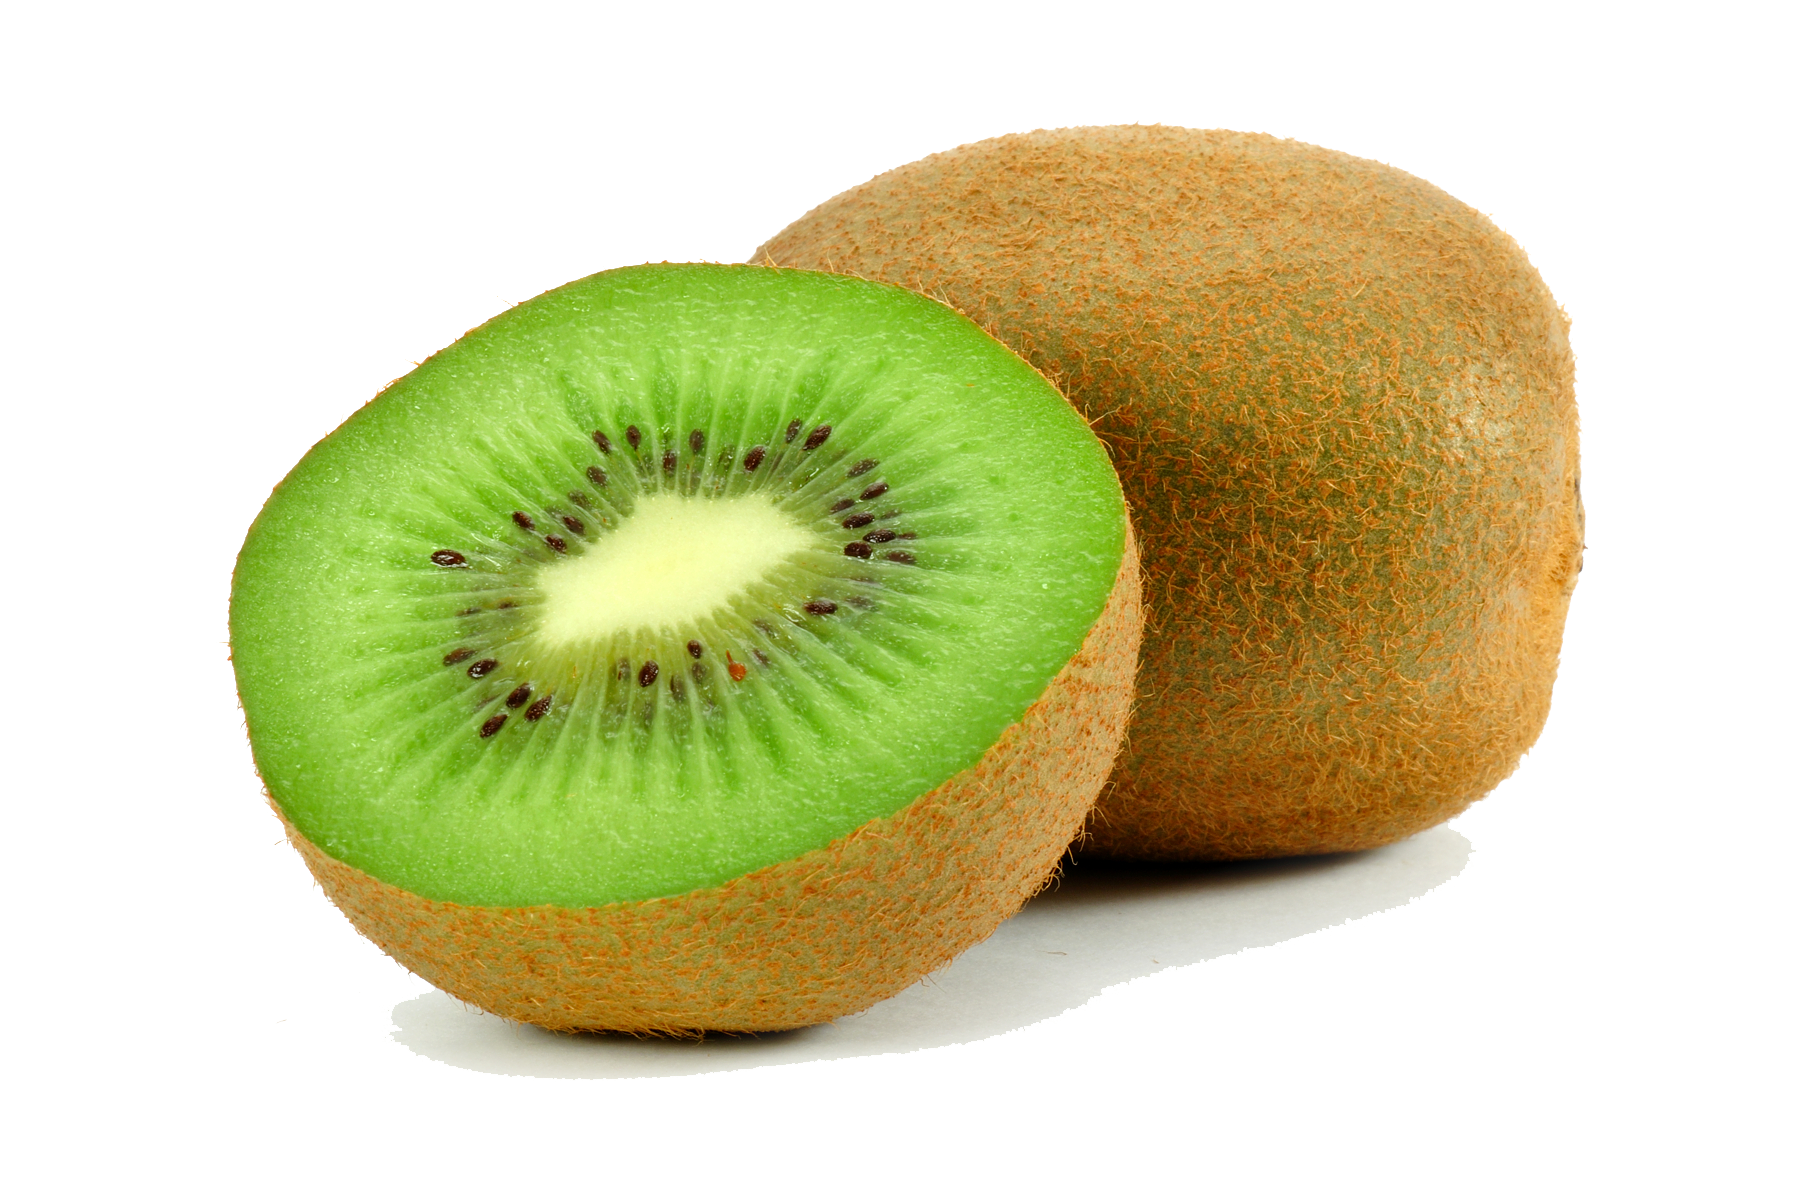 Download Kiwi Fruit PNG Transparent Image.